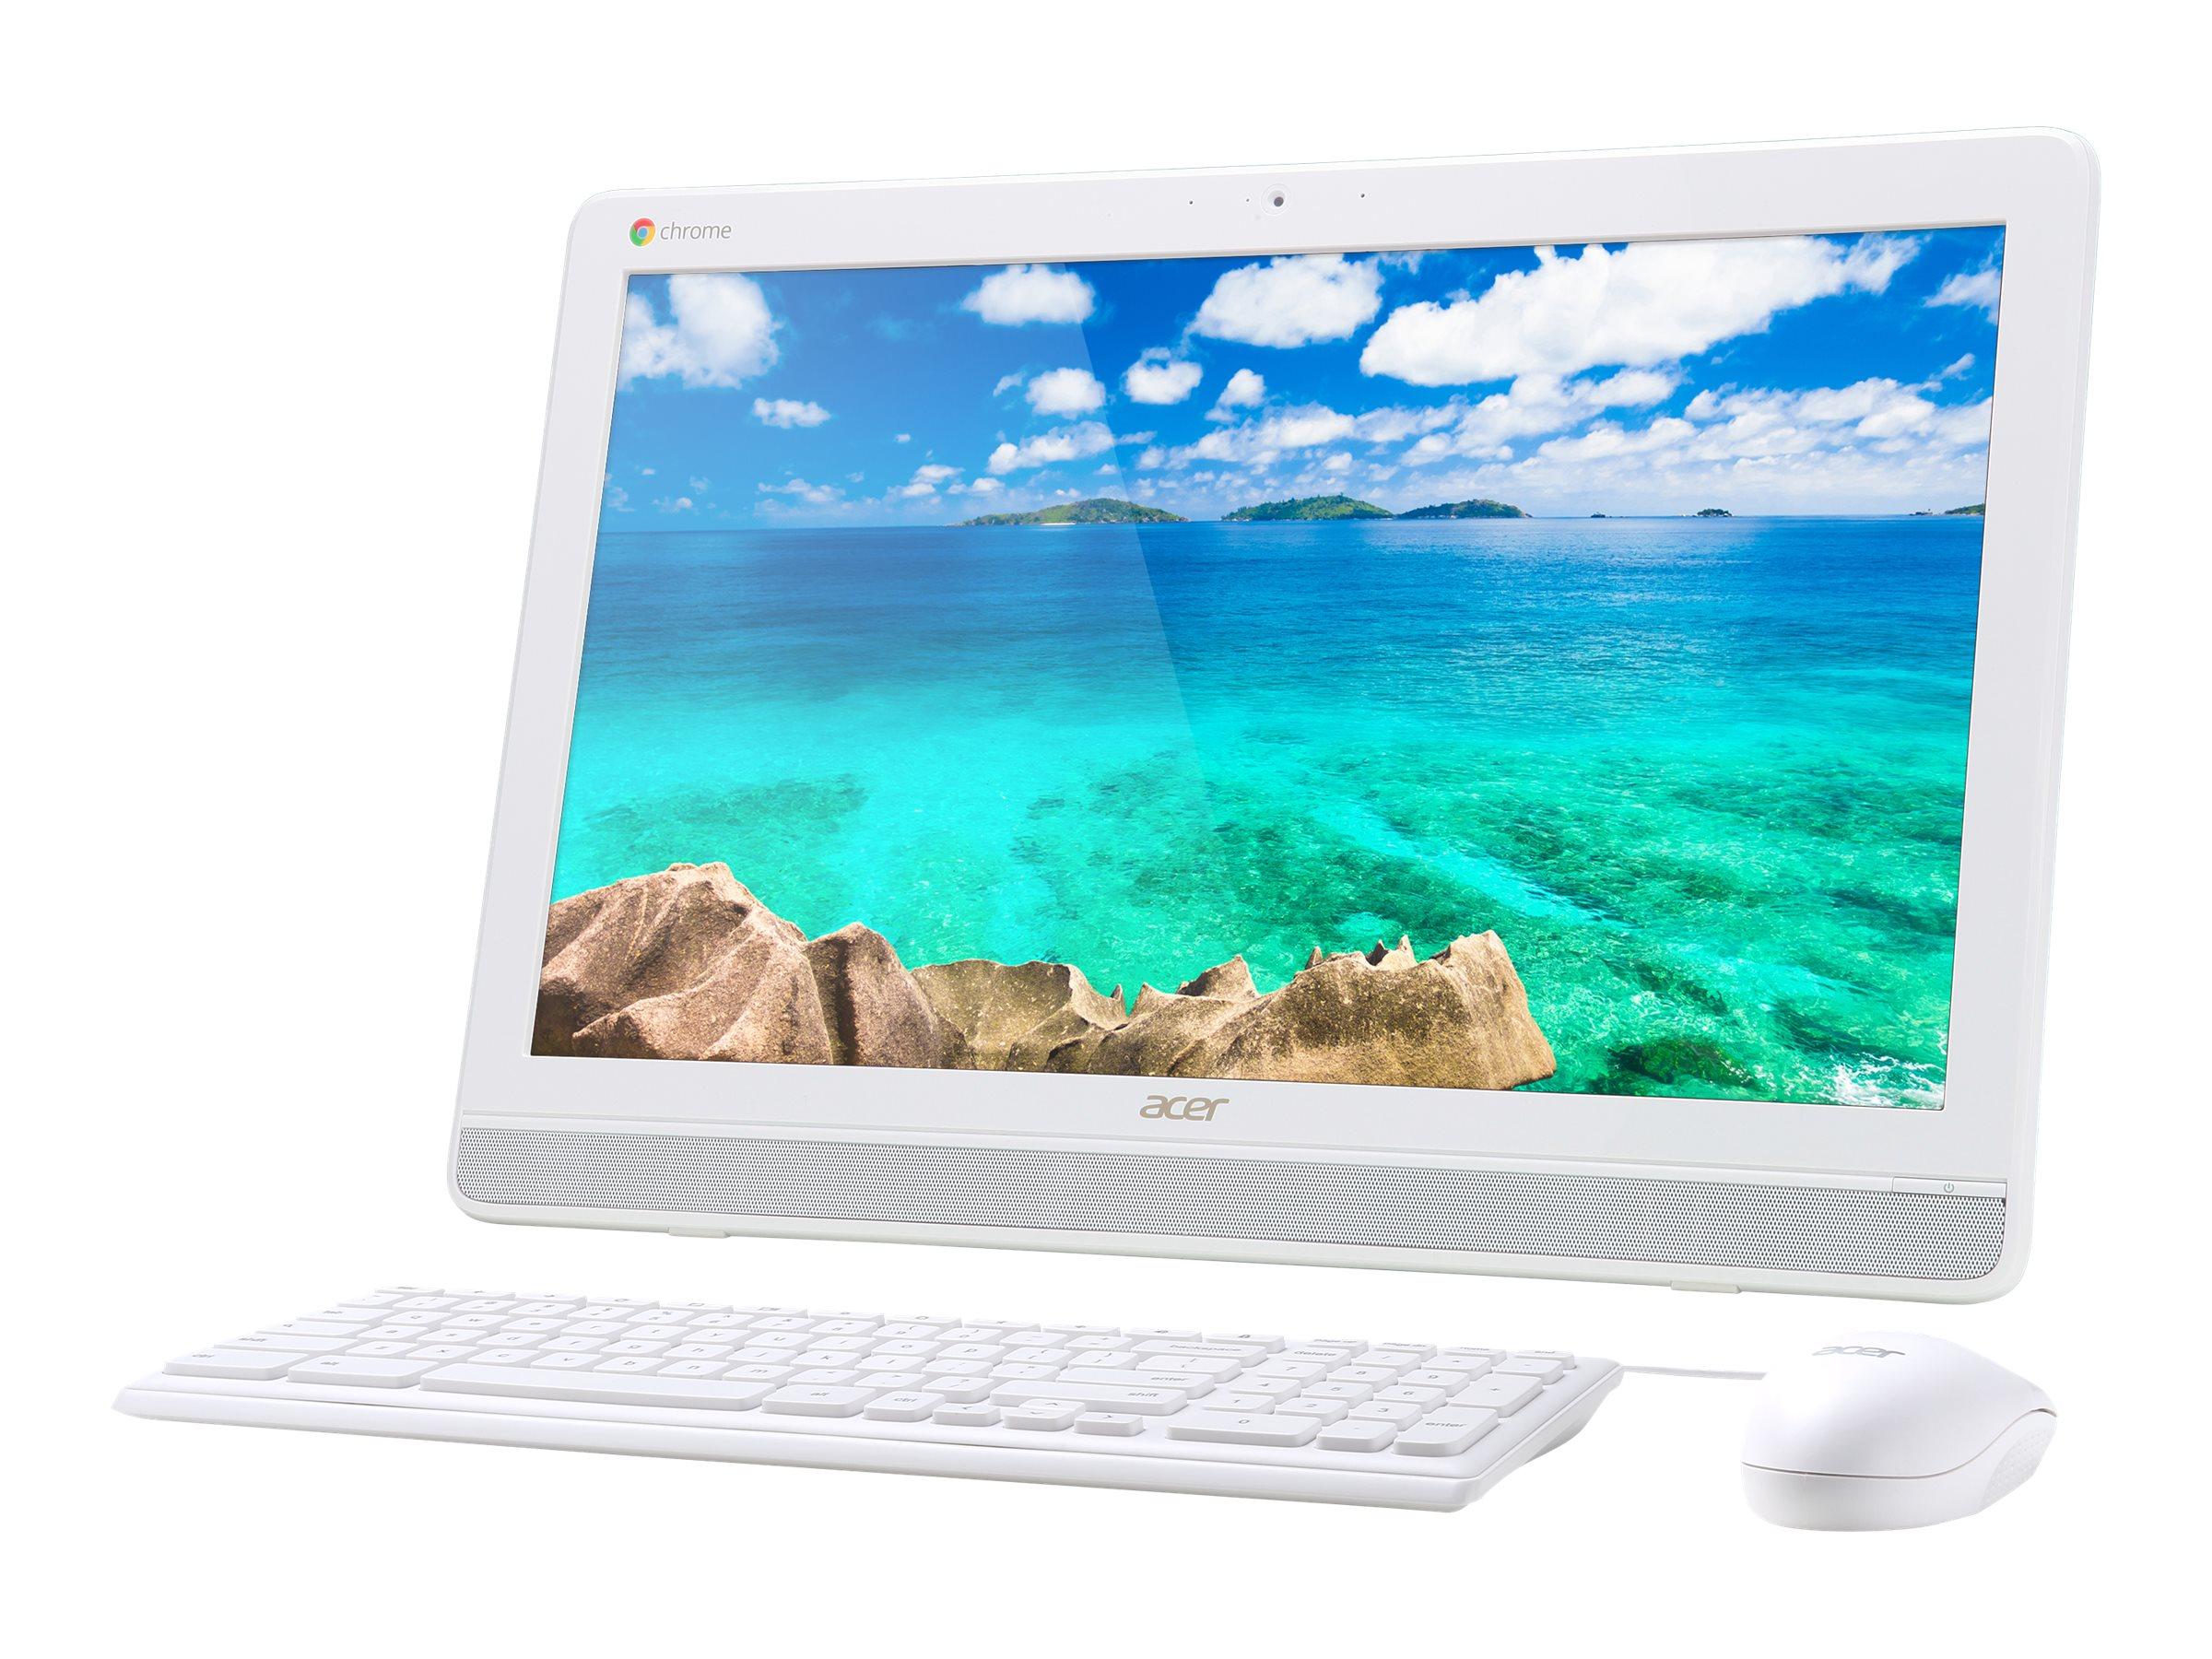 Acer Chromebase DC221HQ CWMIRCZ AIO Tegra K1 QC 2.1GHz 4GB 16GB SSD ac BT WC 21.5 ChromeOS, UM.WD1AA.C01, 30890171, Desktops - All-in-One